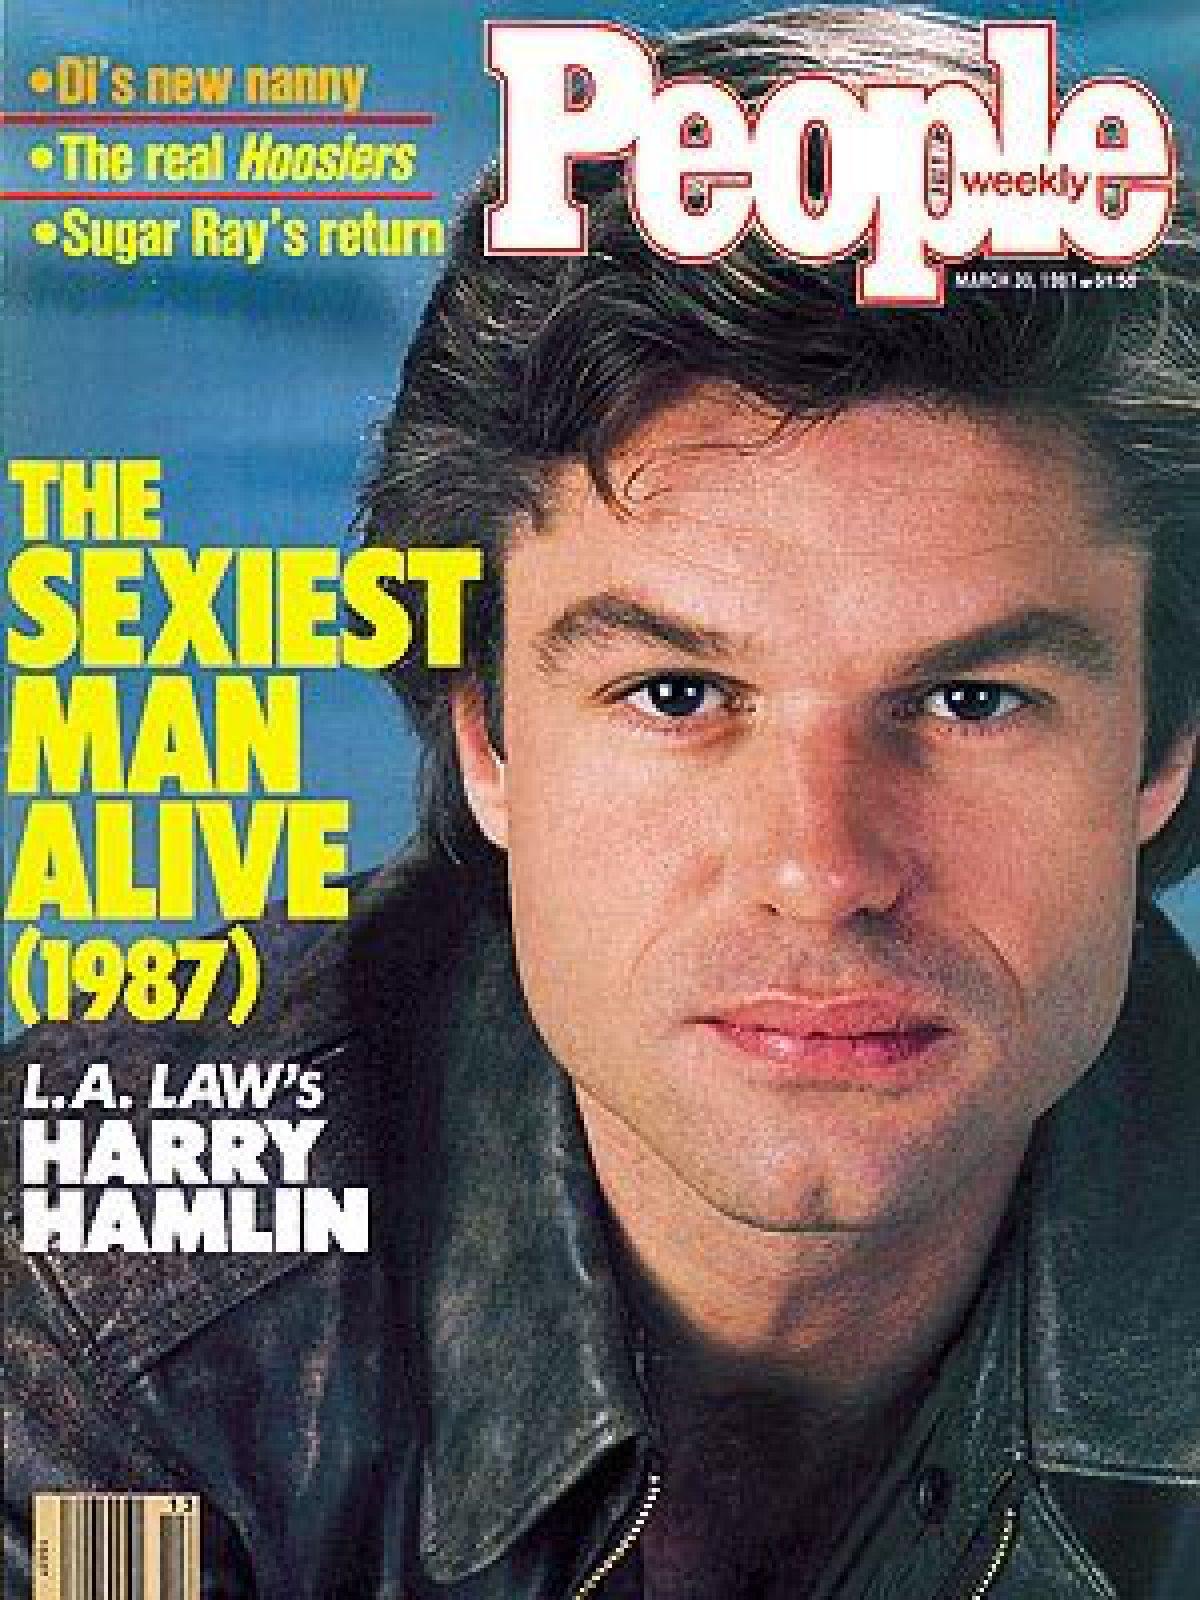 peoples sexiest man alive - 634×880